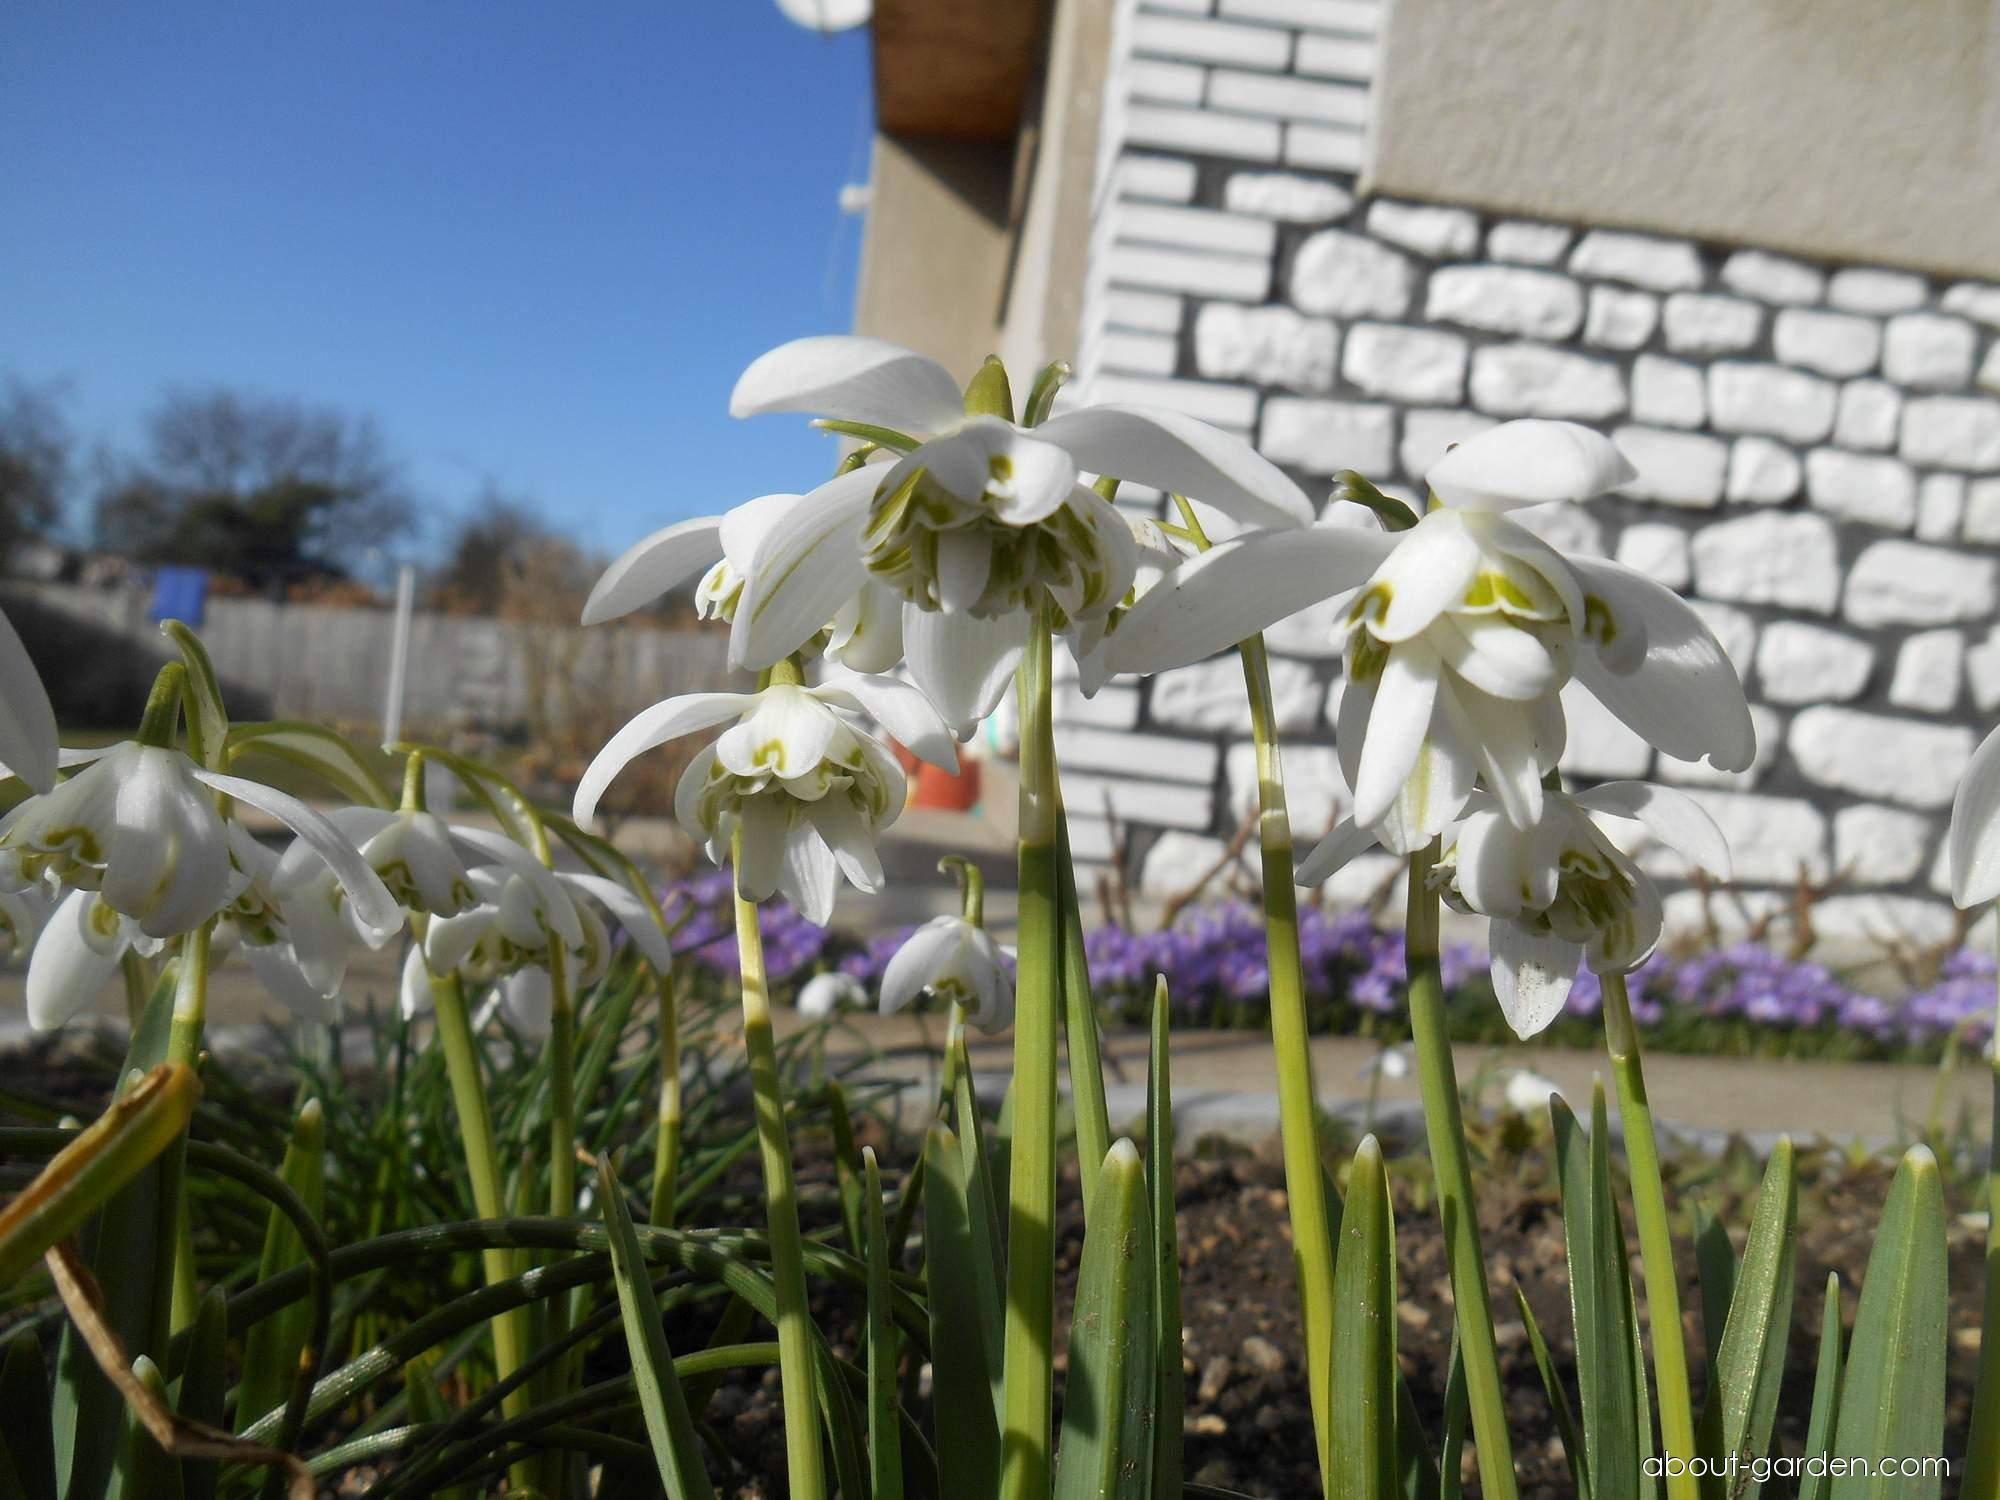 Snowdrop - Galanthus nivalis Flore Pleno